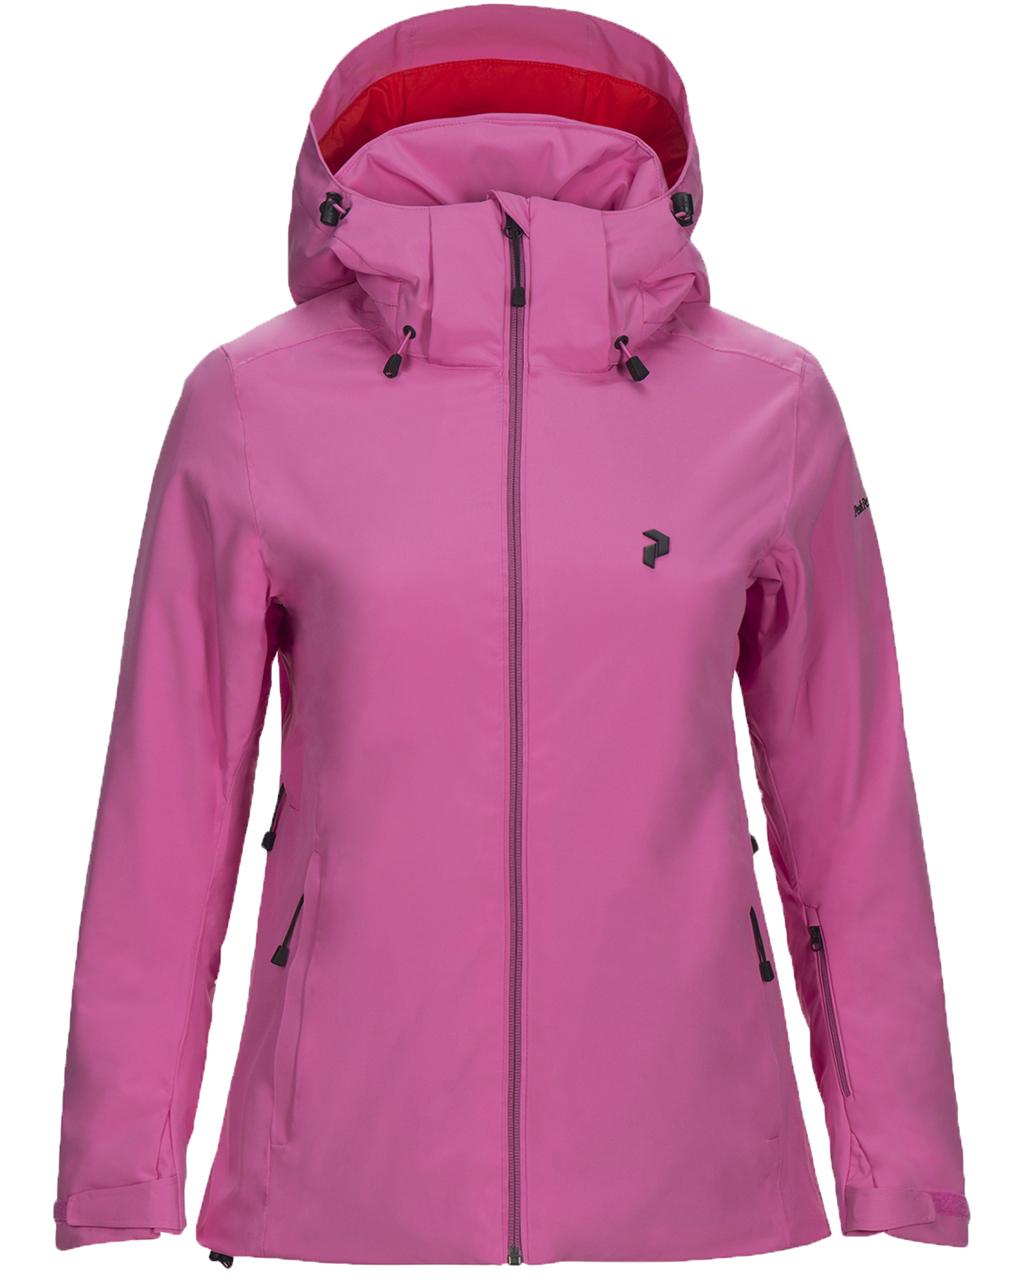 Anima Jacket W Vibrant Pink